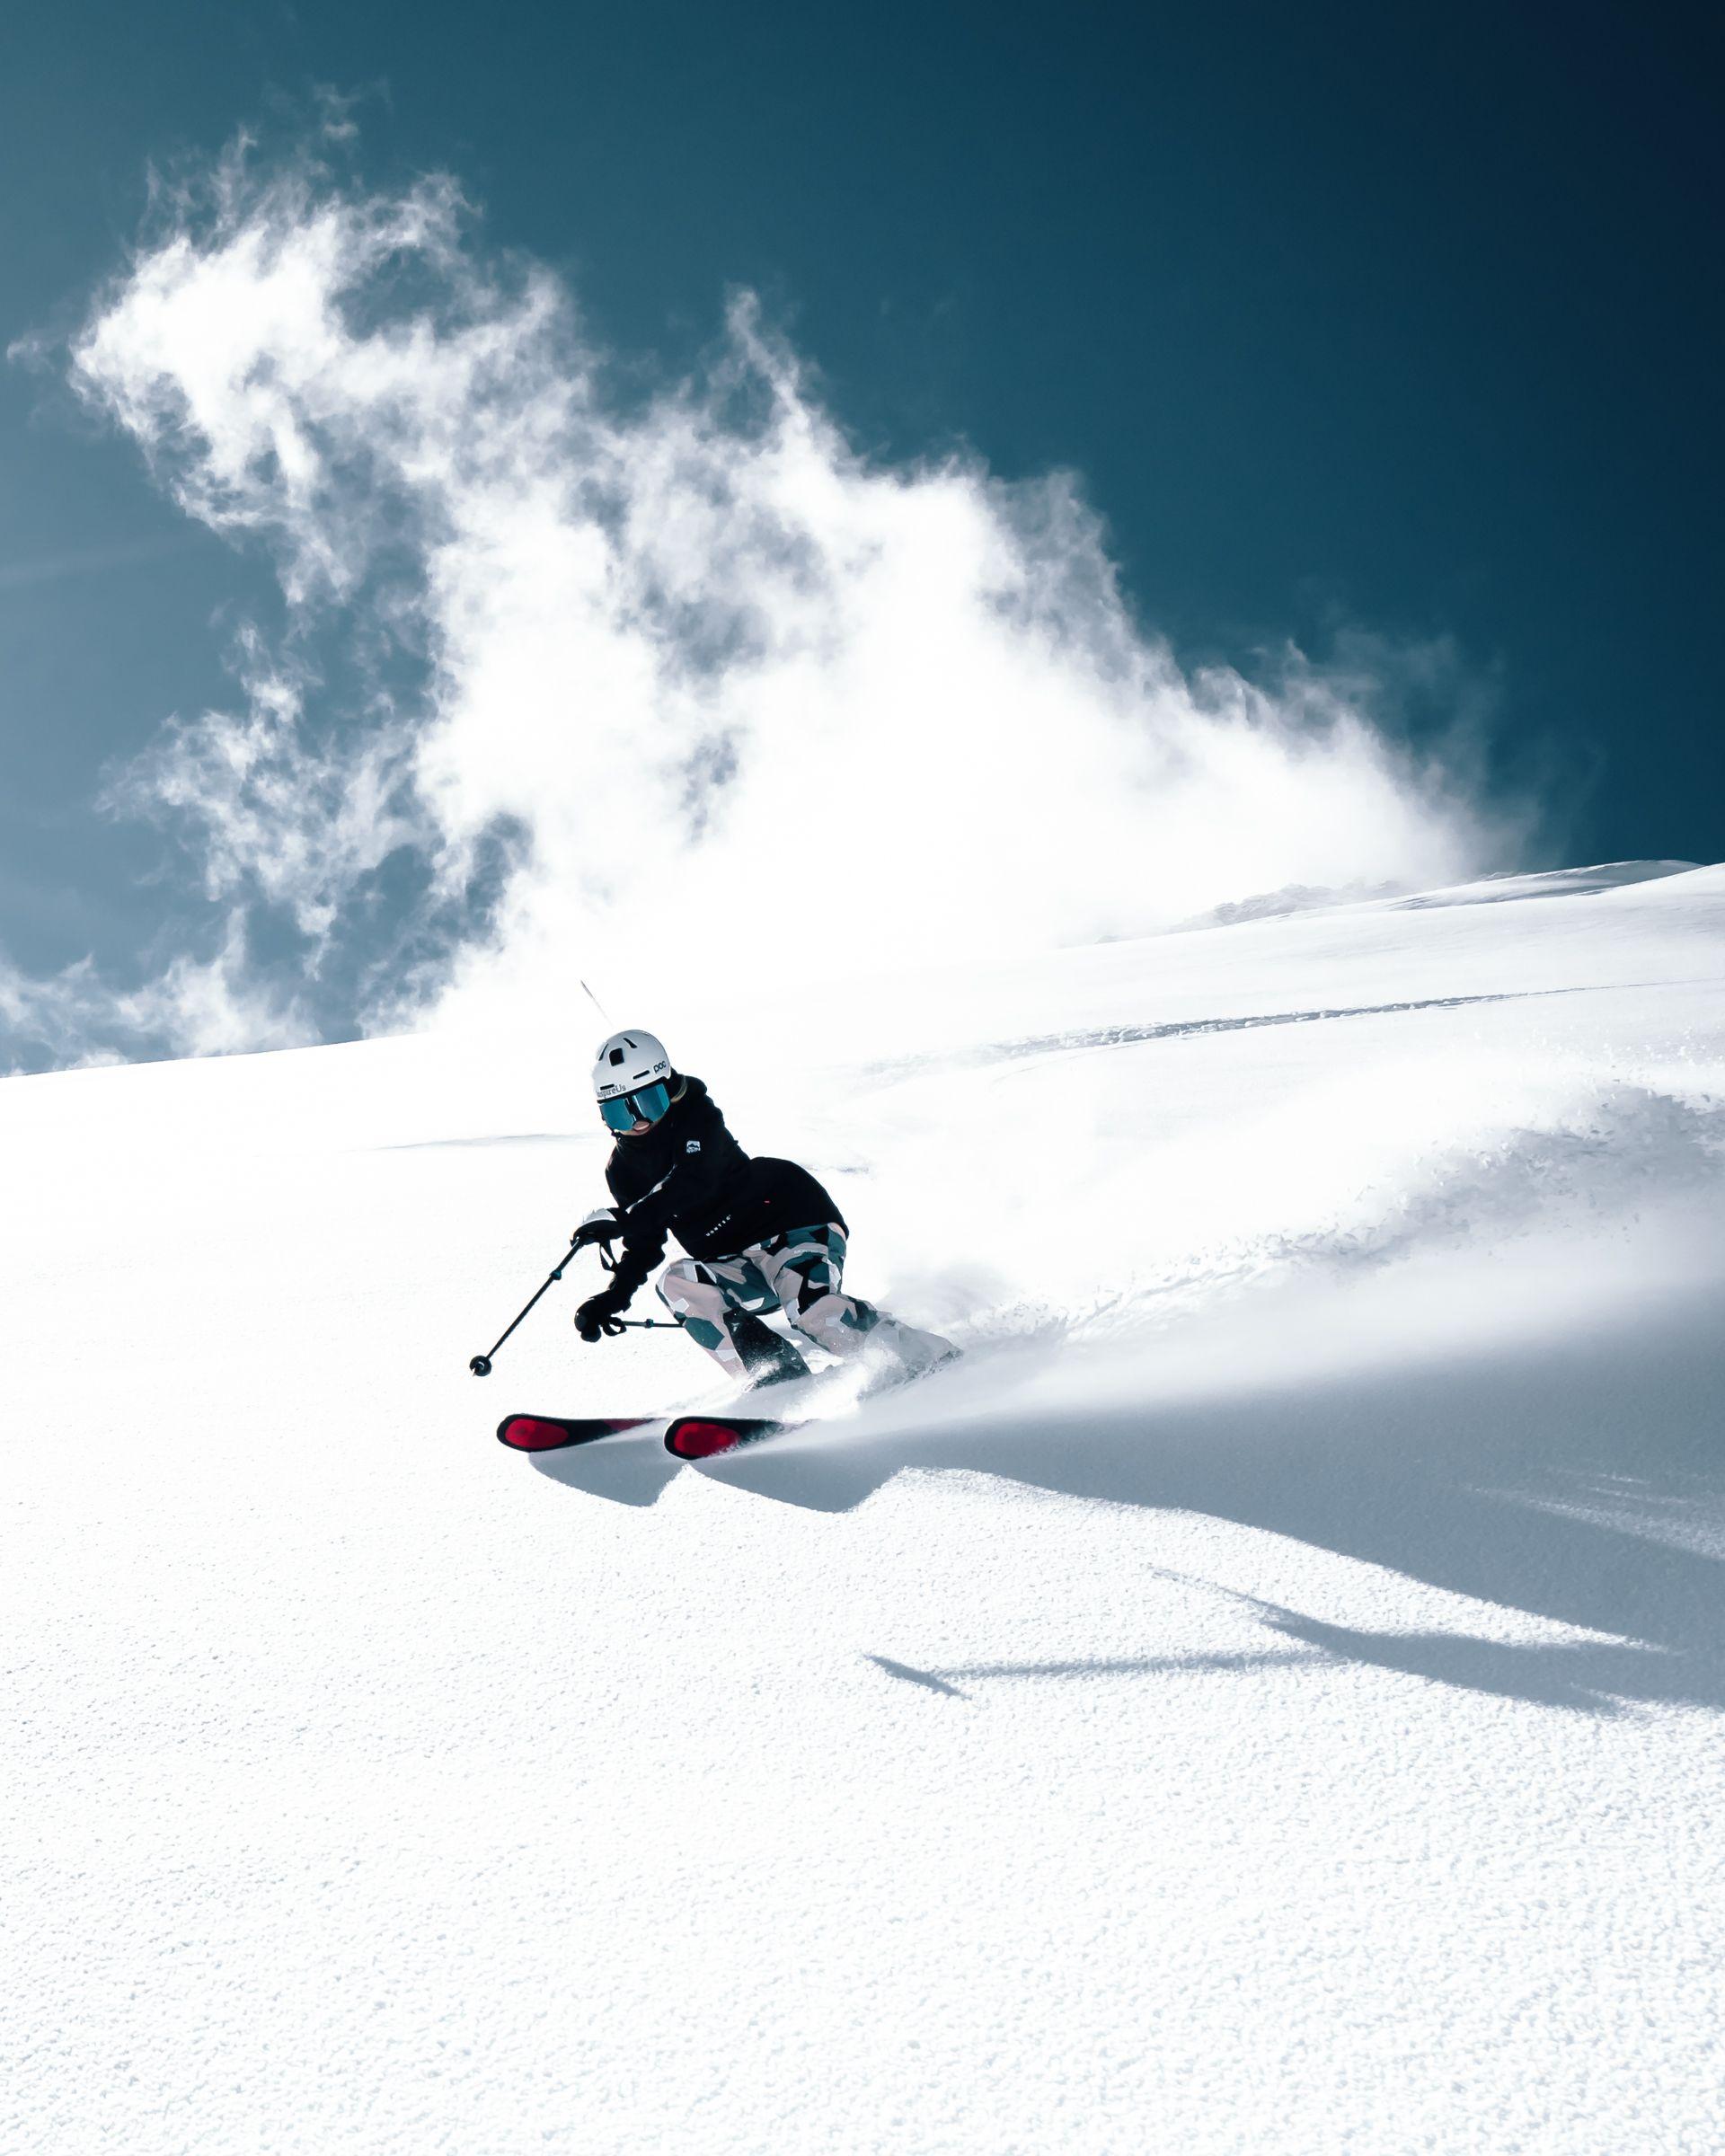 Shop The Best Ski And Snowboard Outfits At Www Montecwear Com I 2020 Med Bilder